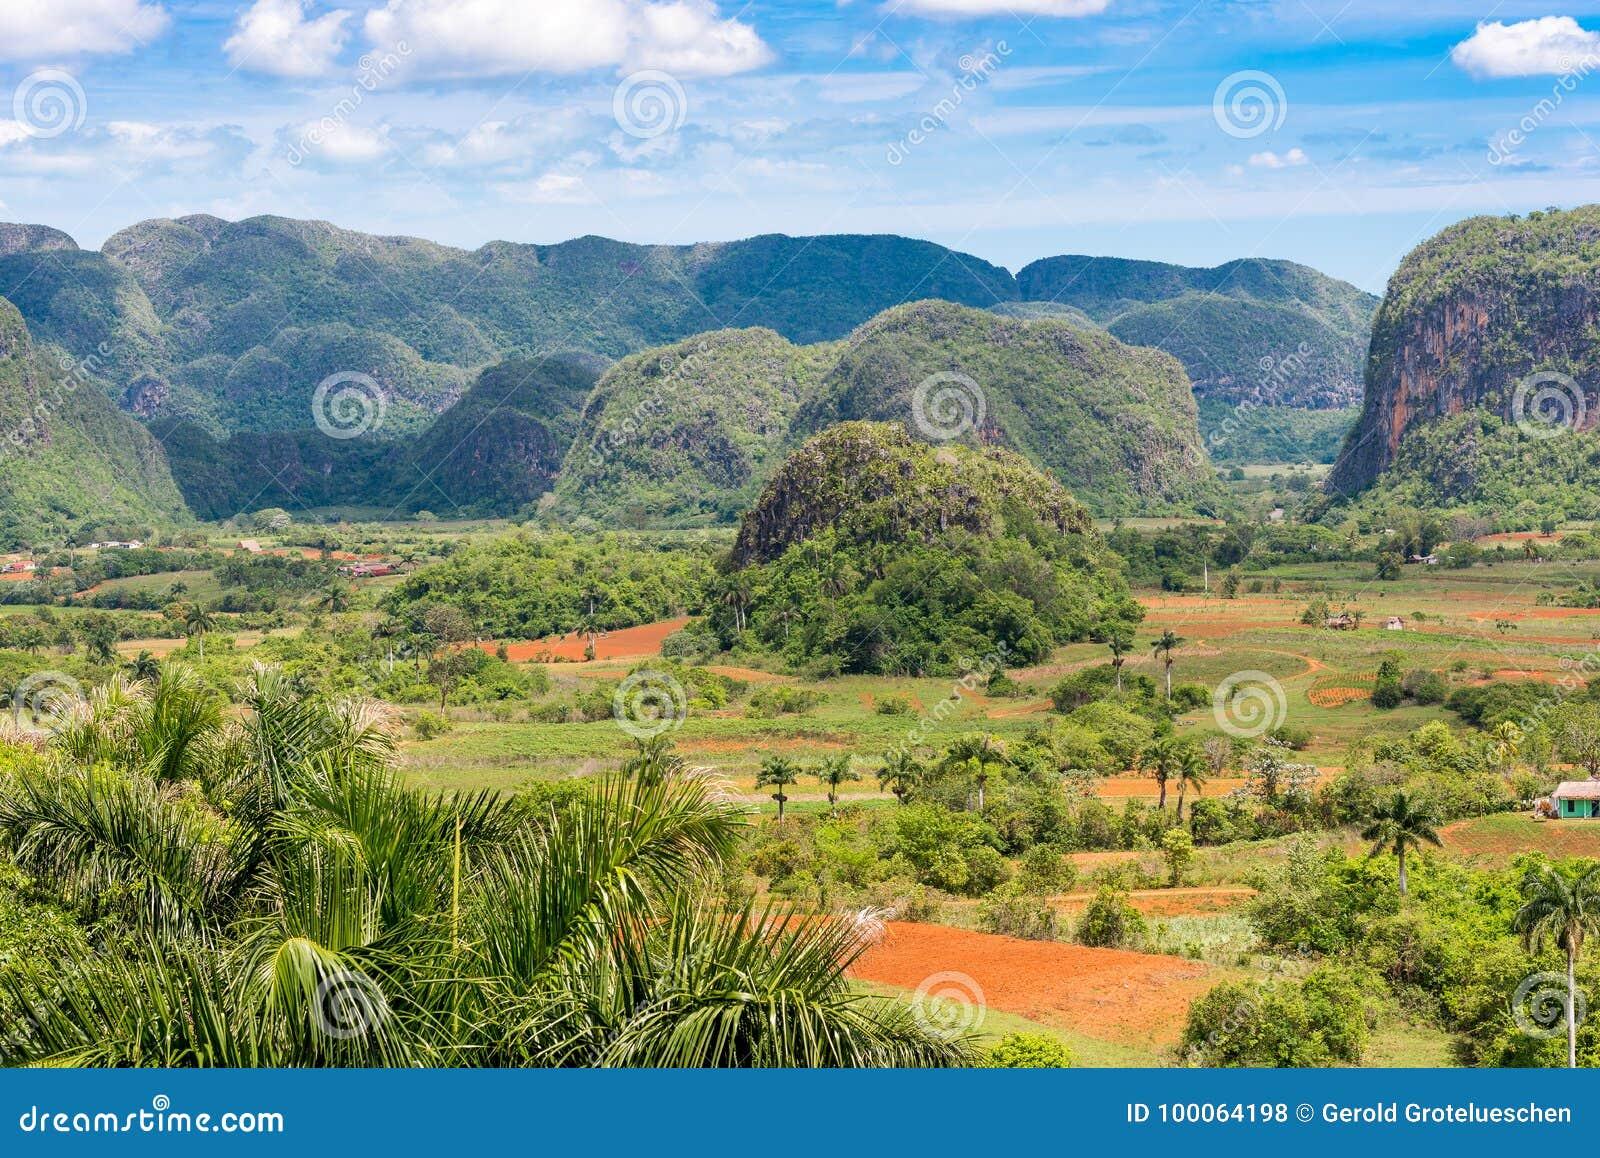 Vista do vale de Vinales, Pinar del Rio, Cuba Copie o espaço para o texto